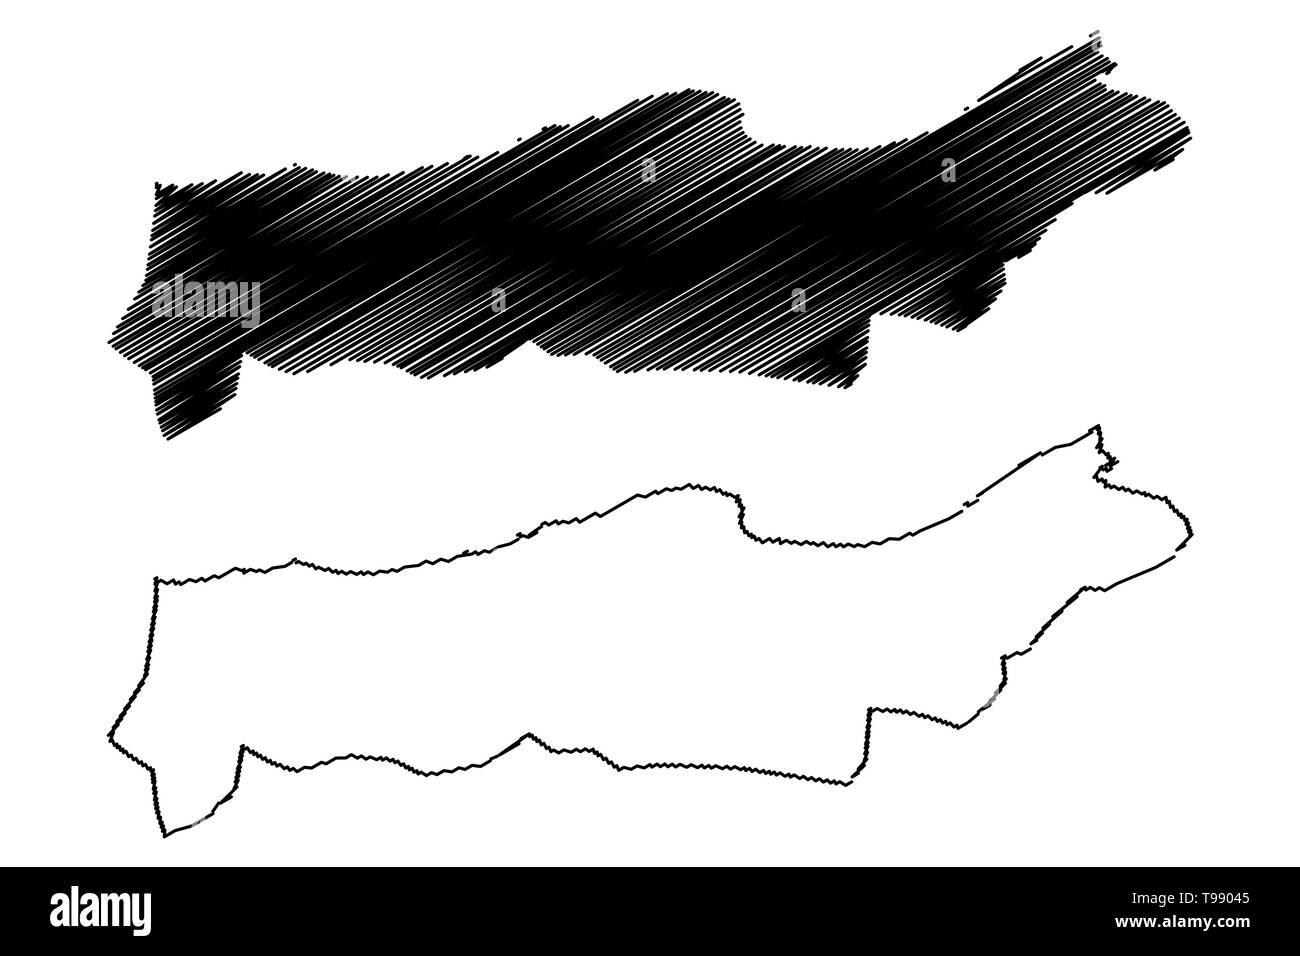 Tipaza Province (Provinces of Algeria, Peoples Democratic Republic of Algeria) map vector illustration, scribble sketch Tipasa map - Stock Image